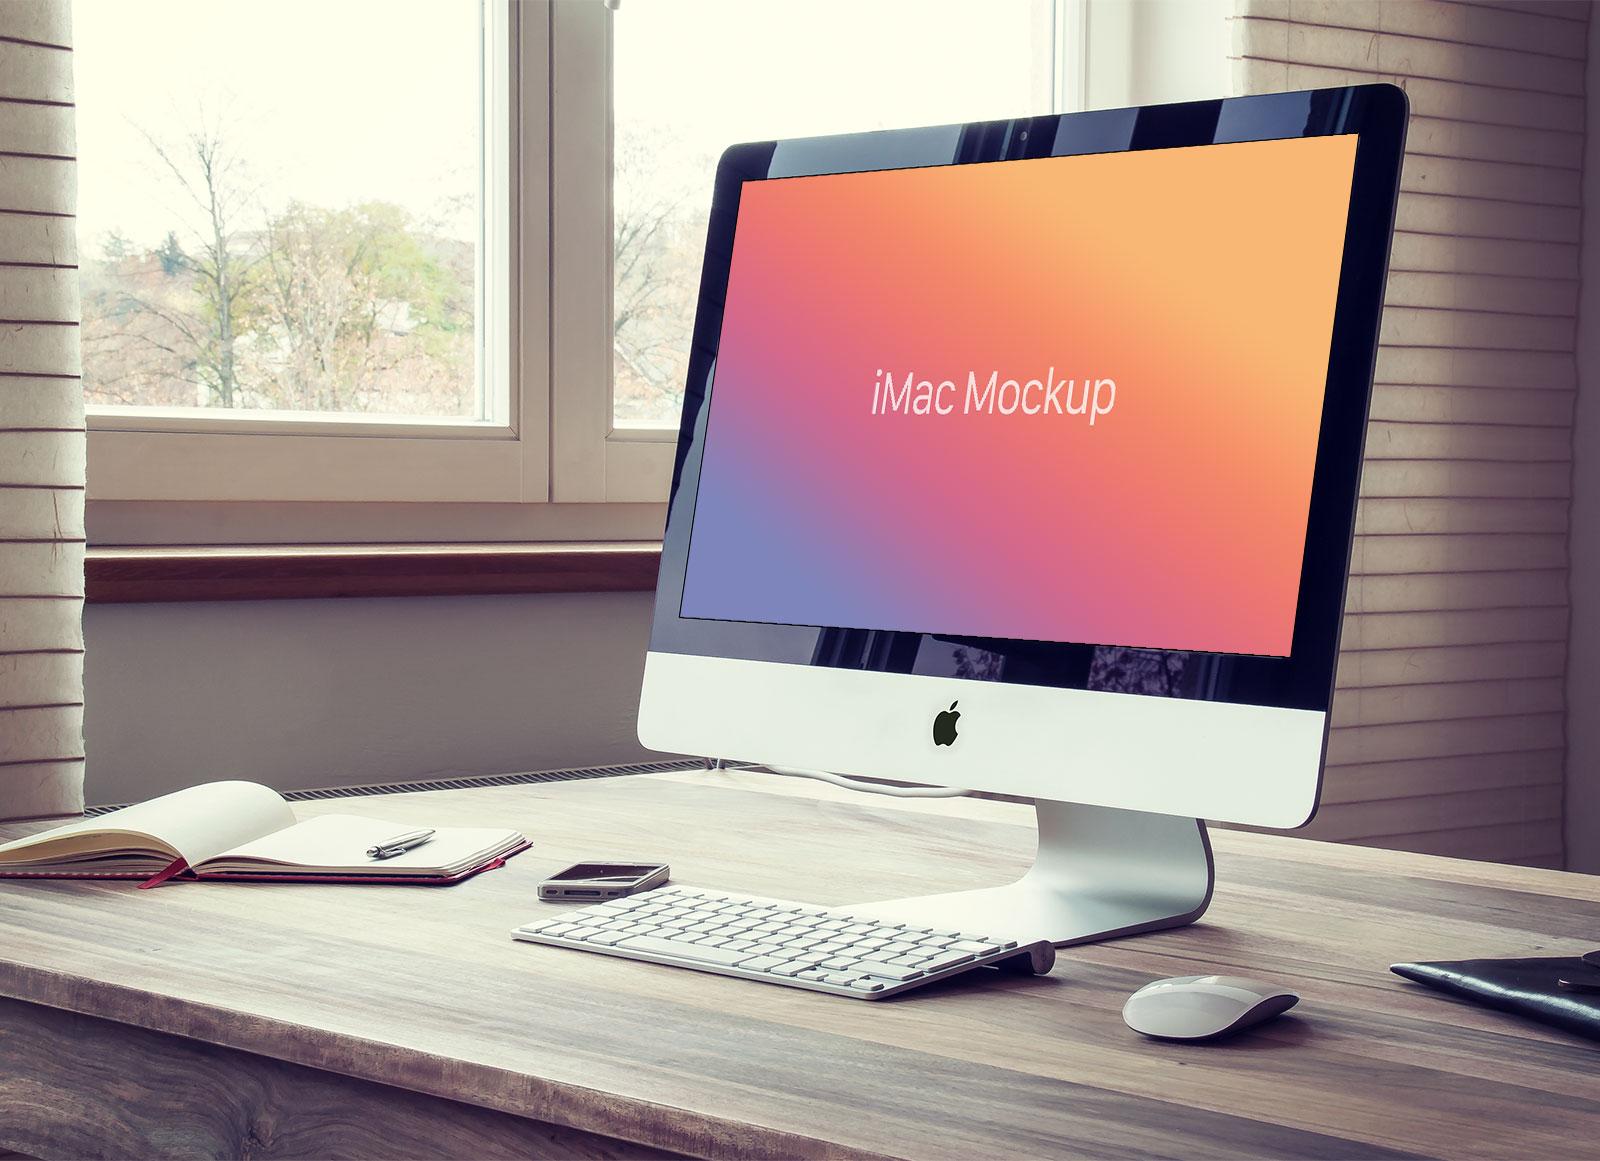 Free-Apple-iMac-Photo-Mockup-PSD-File